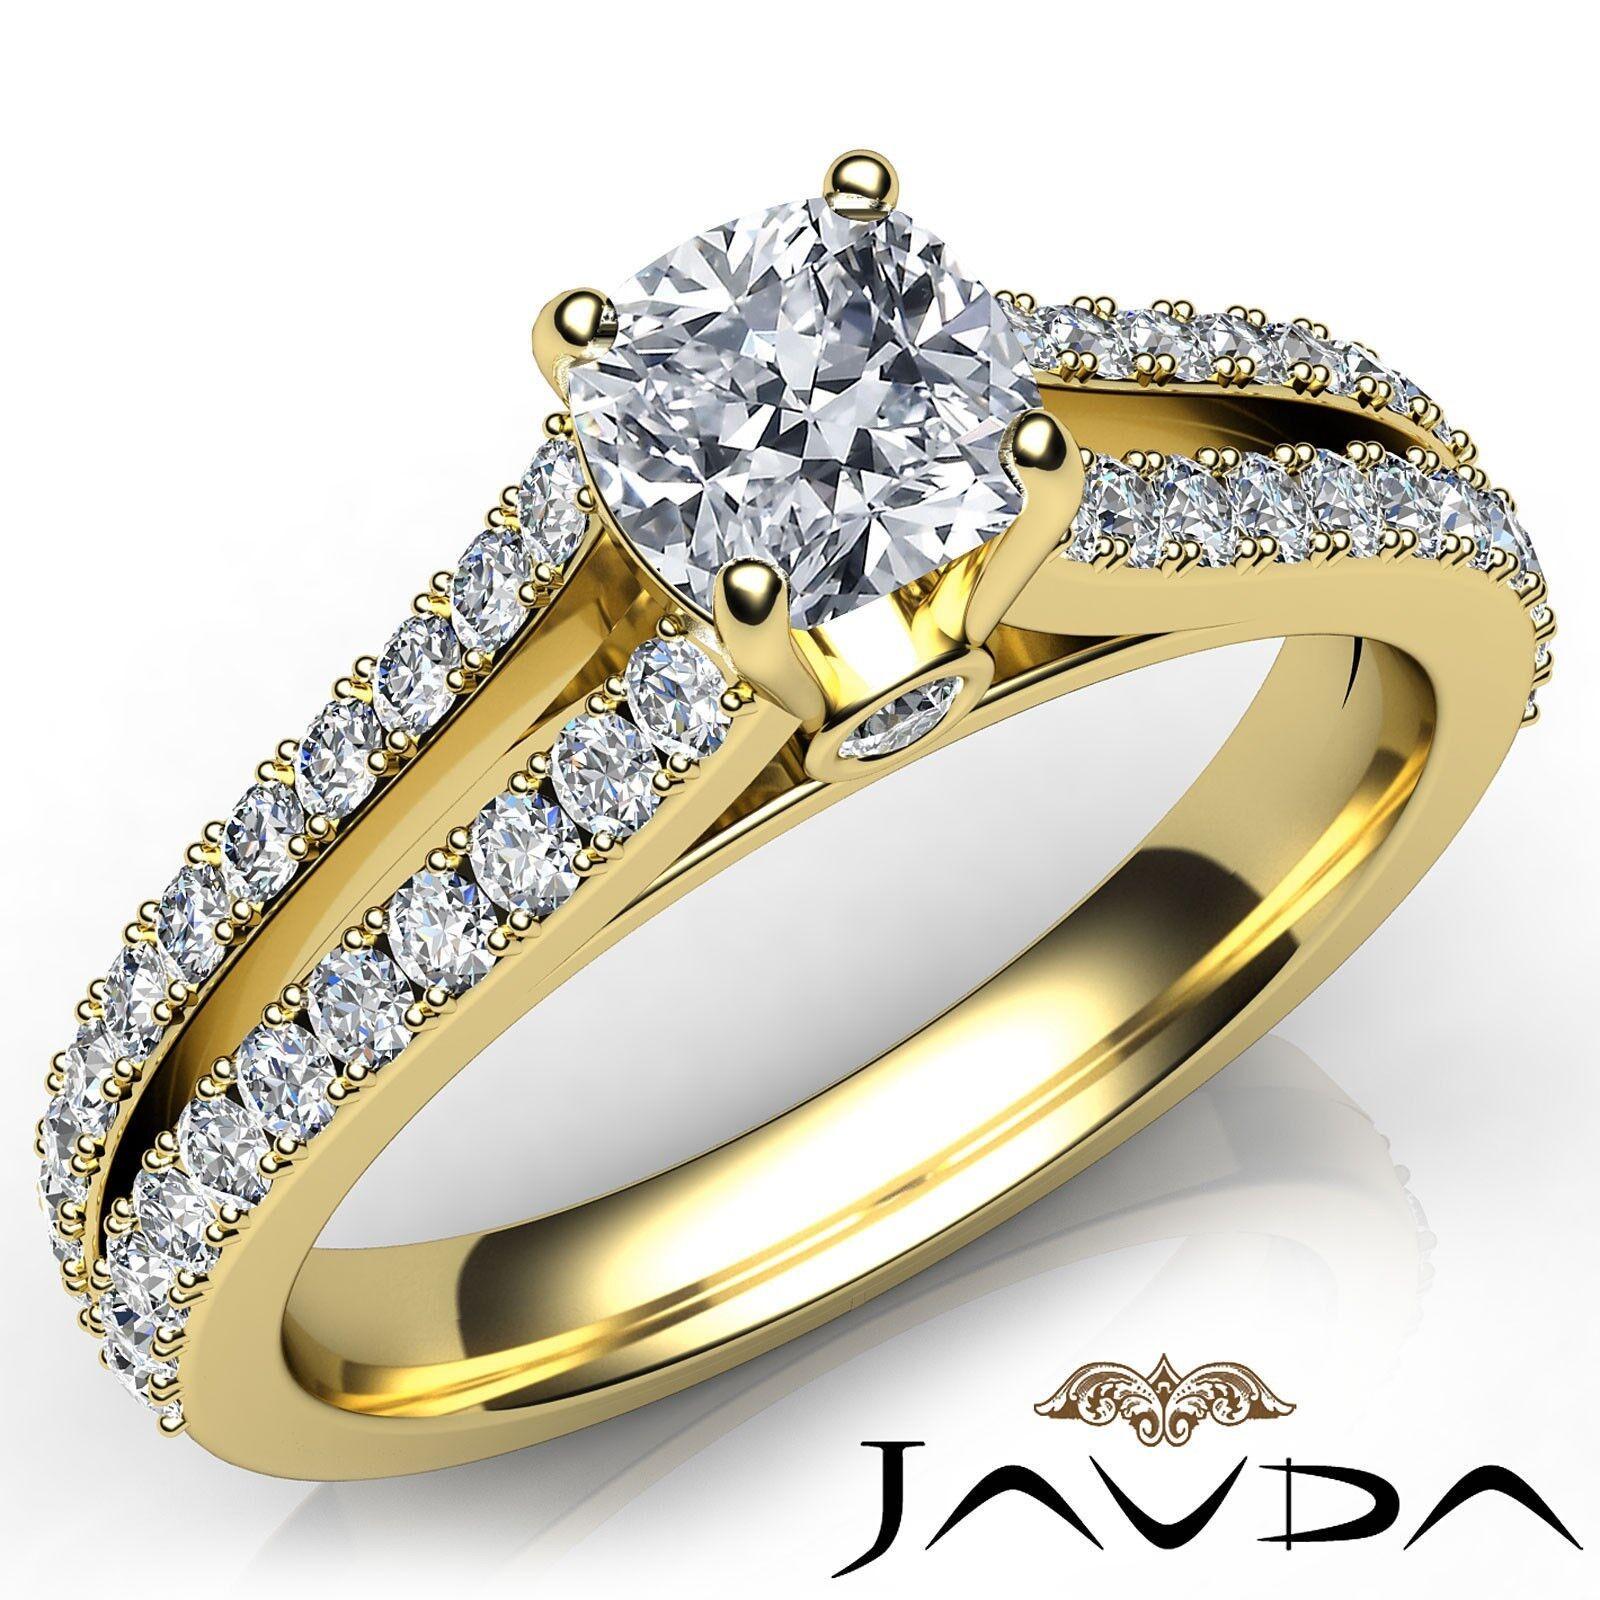 Split Shank French V Pave Cushion Cut Diamond Engagement Ring GIA G VVS2 1.15Ct